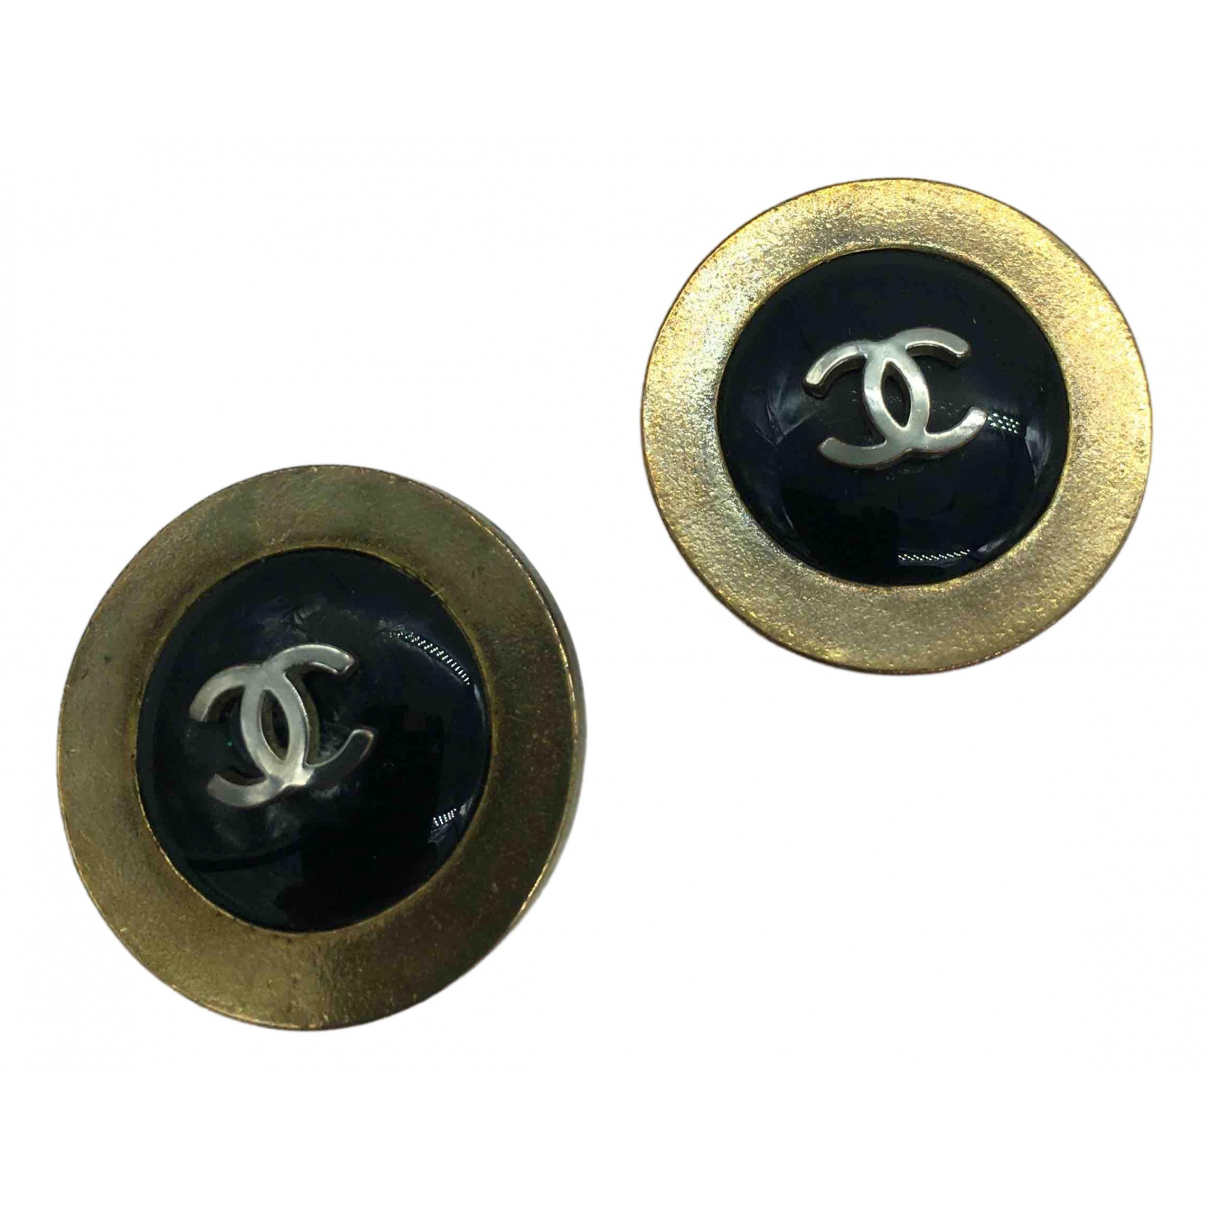 Chanel \N OhrRing in  Schwarz Metall